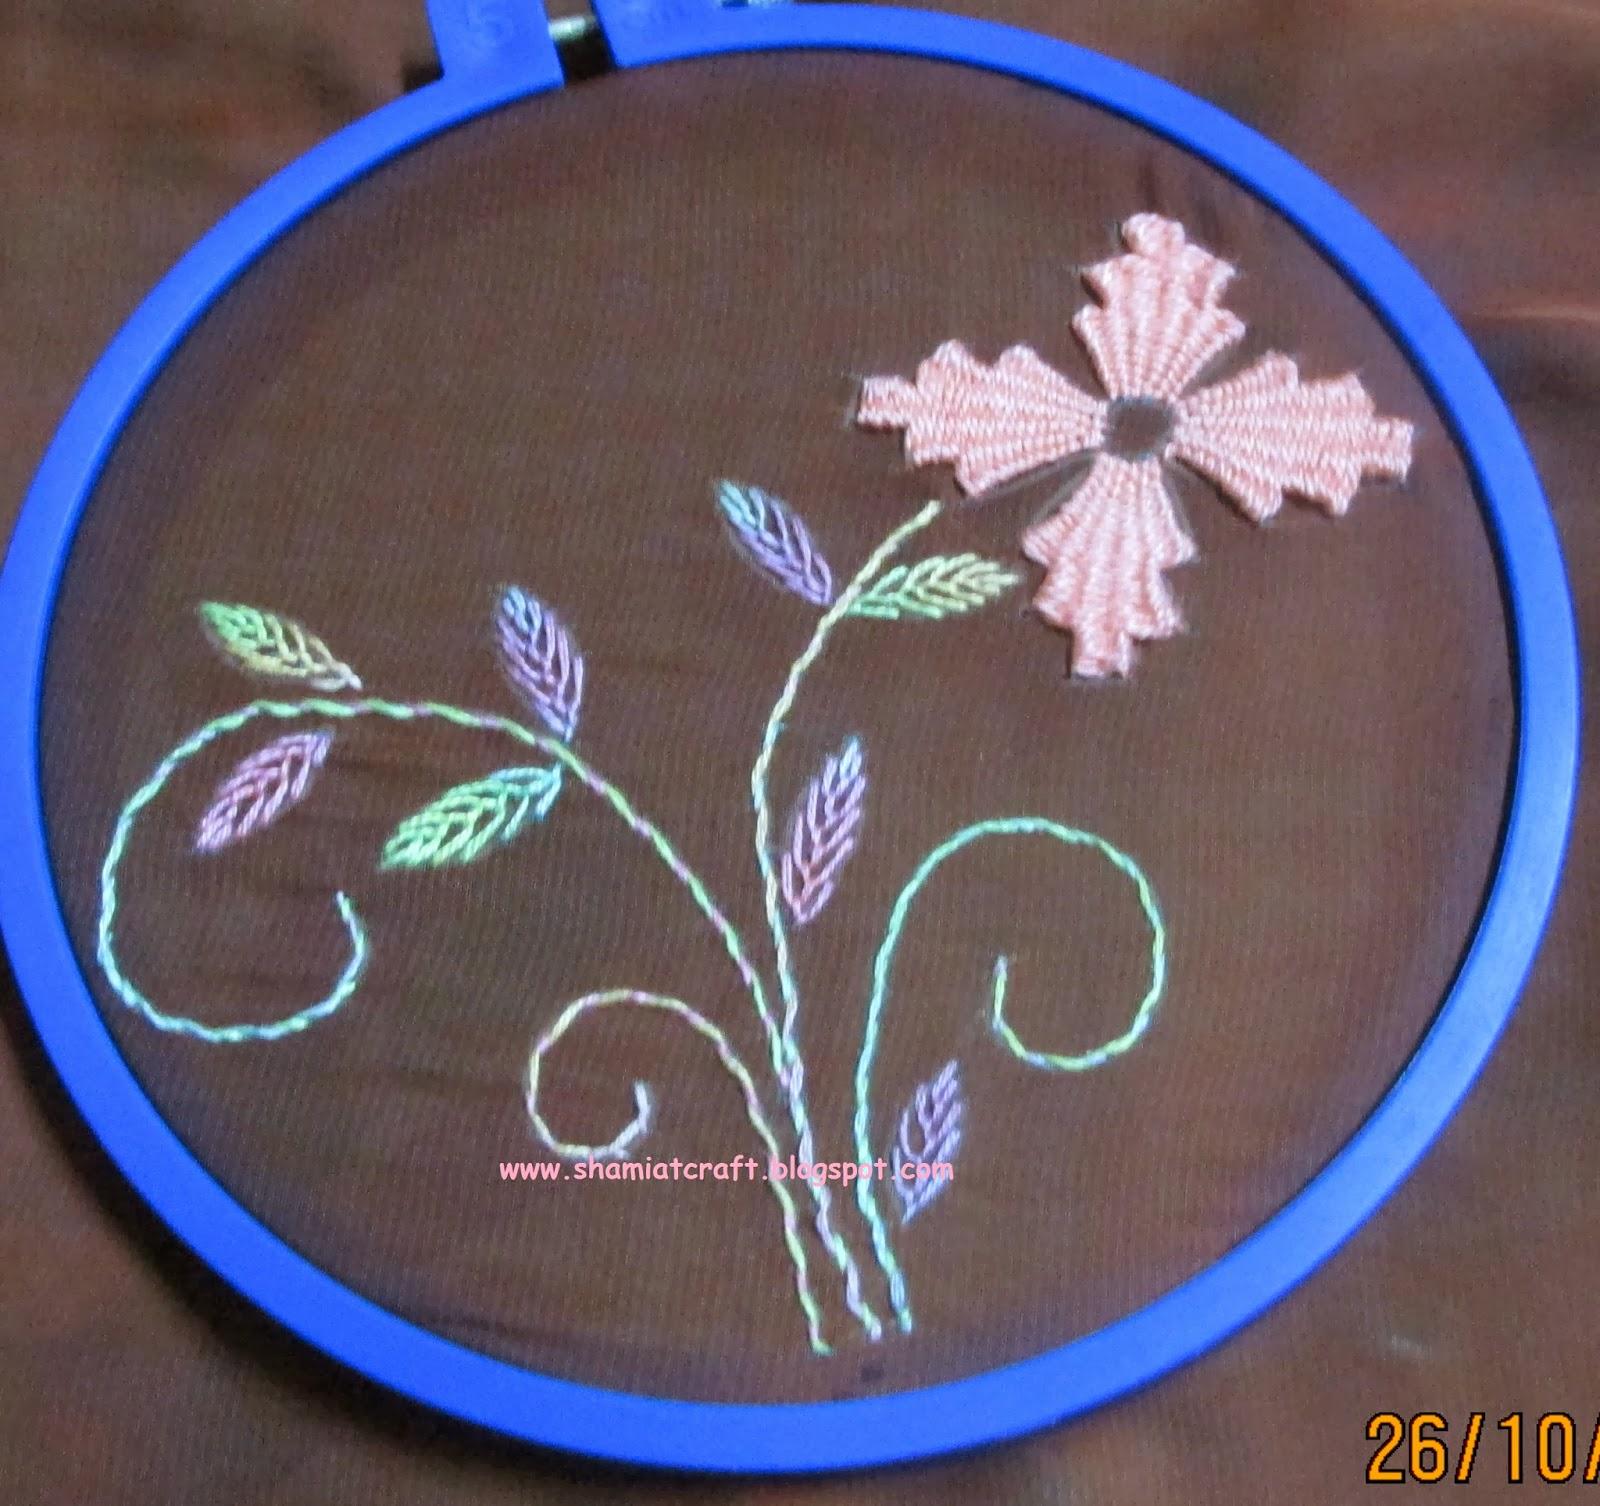 My craft works kamal kadai flower